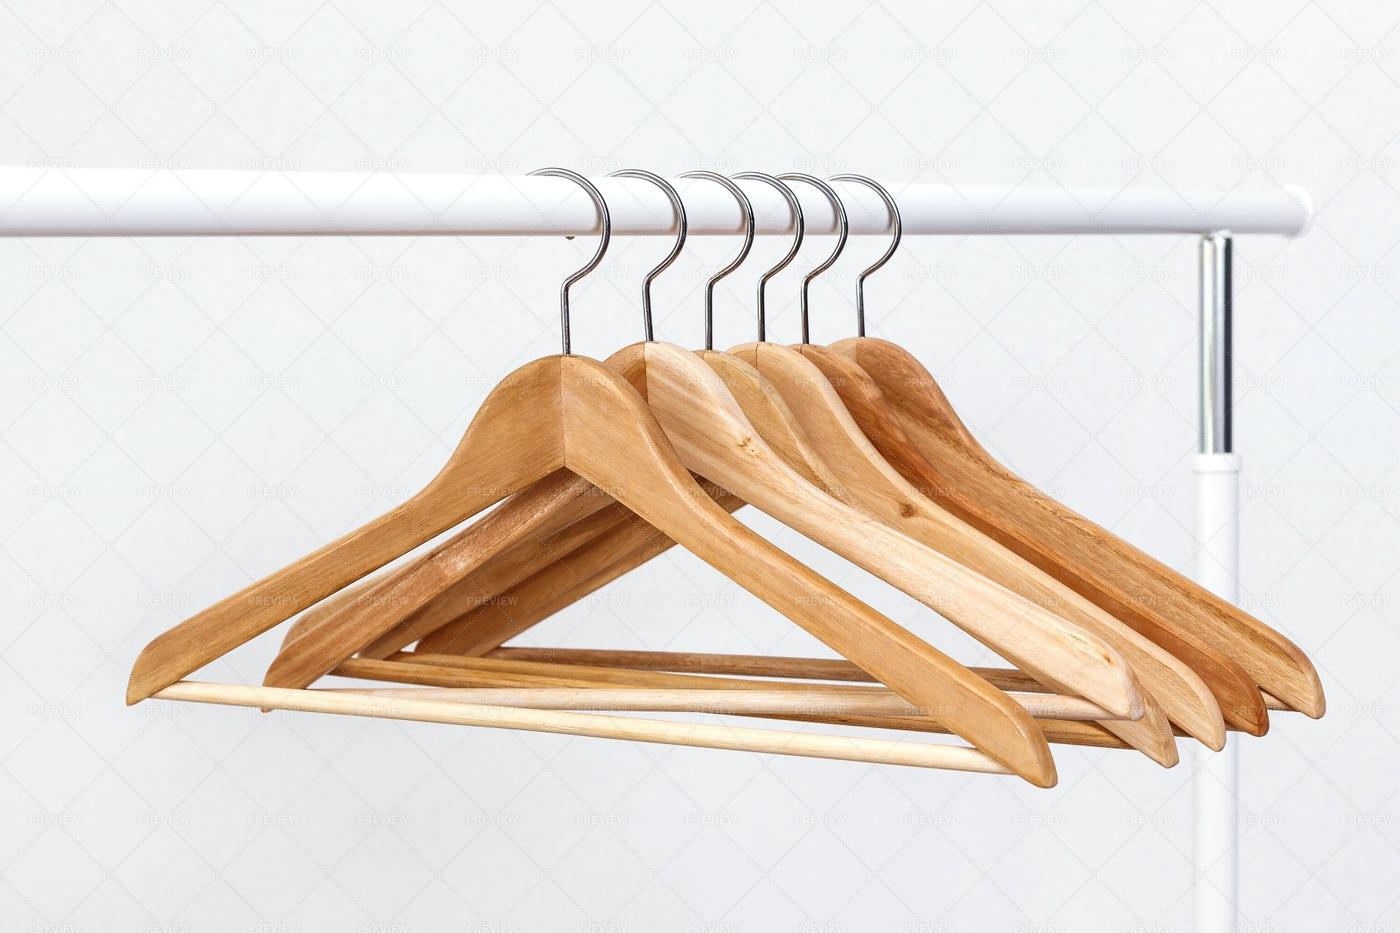 Wooden Clothes Hangers: Stock Photos